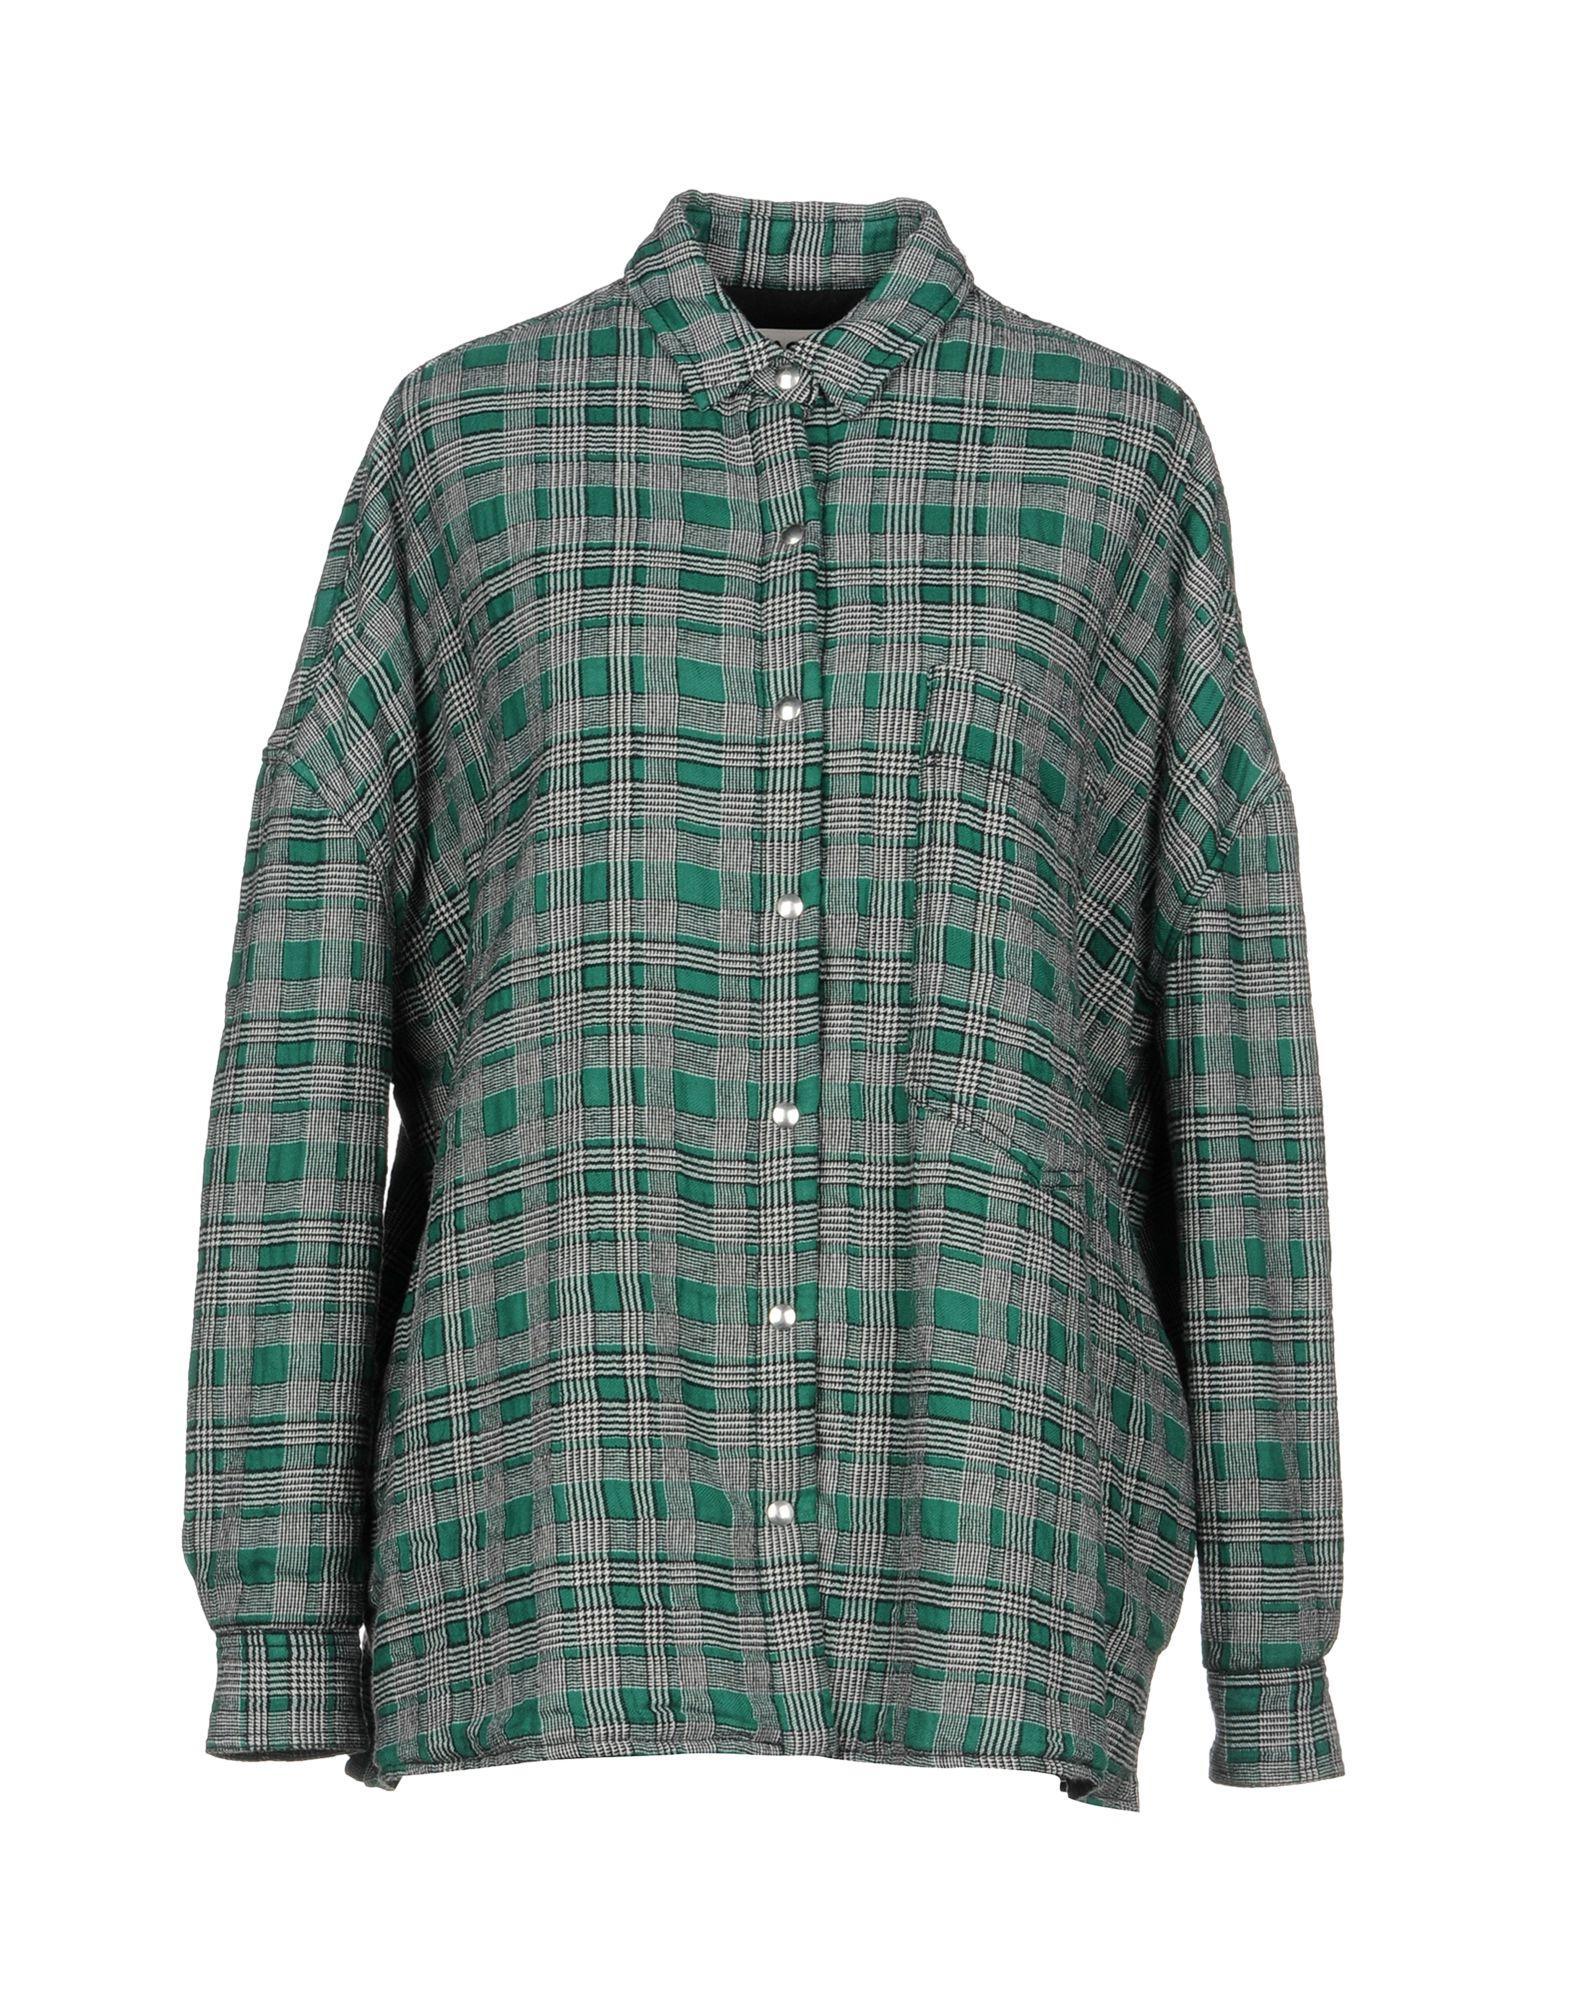 Hache Jacket In Green